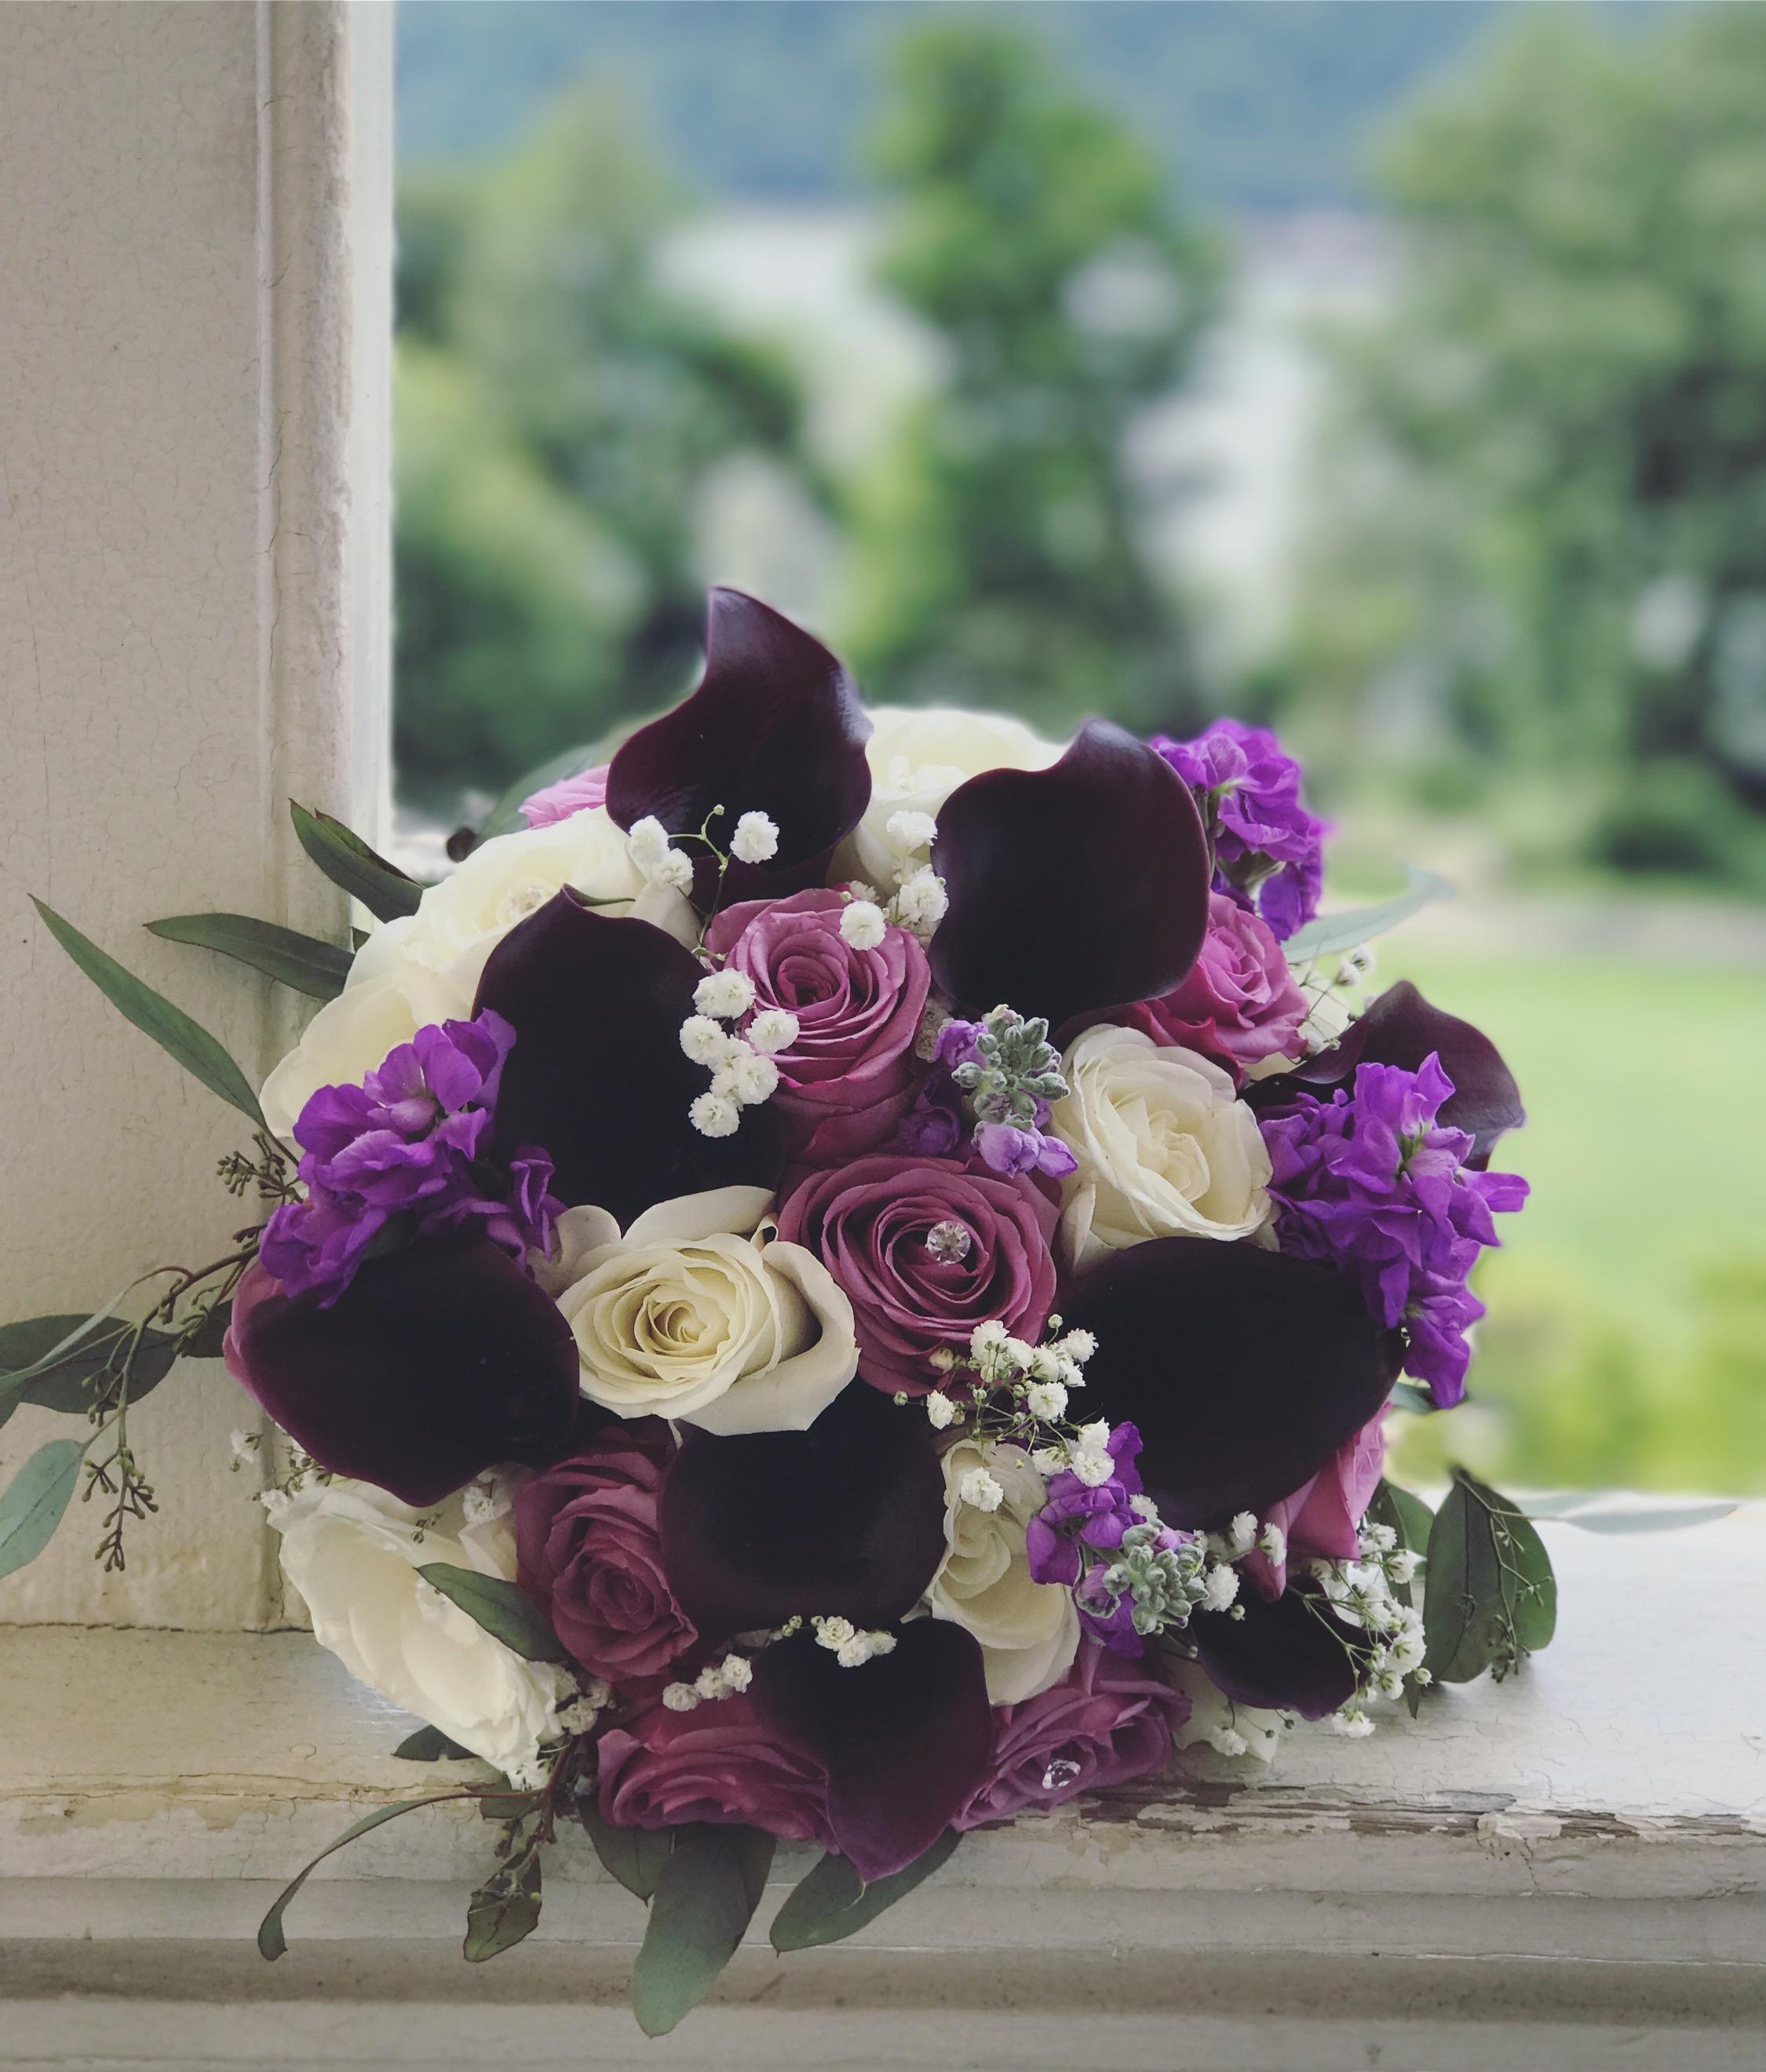 Evelisa Floral & Design: Bride's boquet